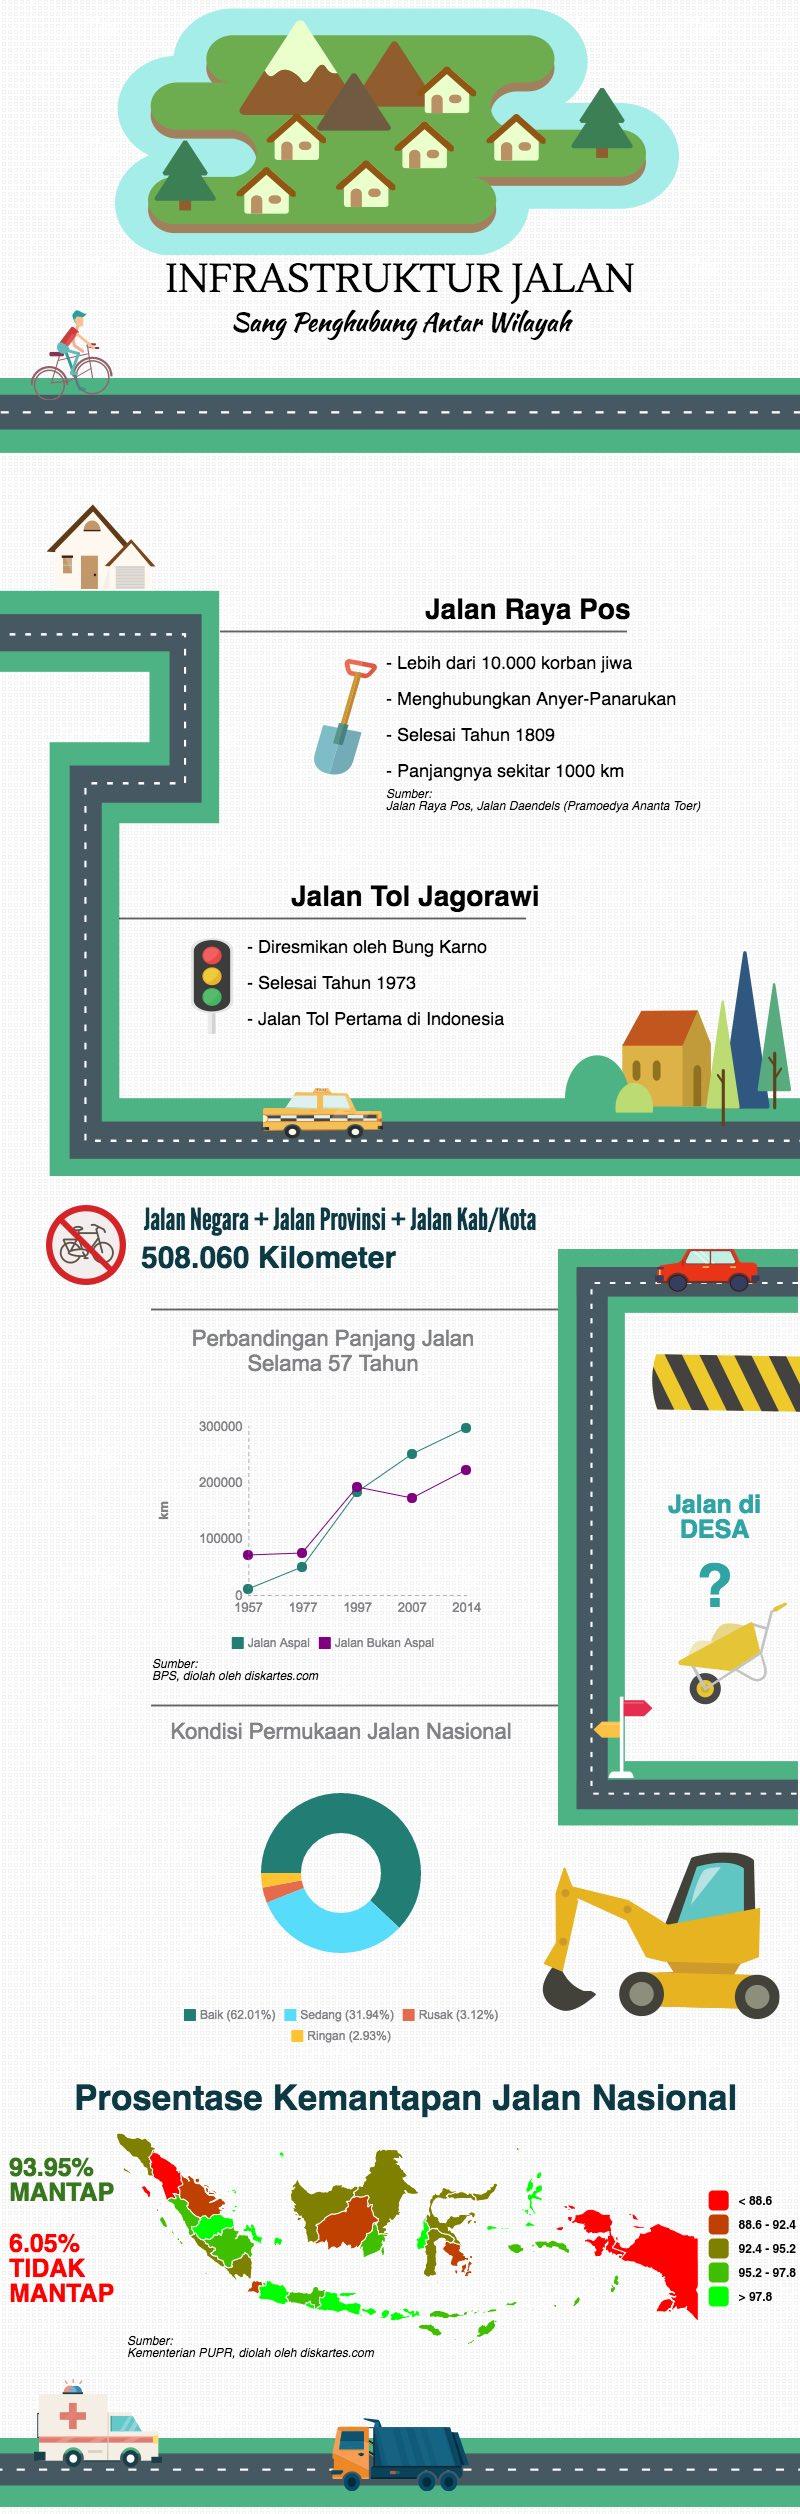 infografis infrastruktur jalan